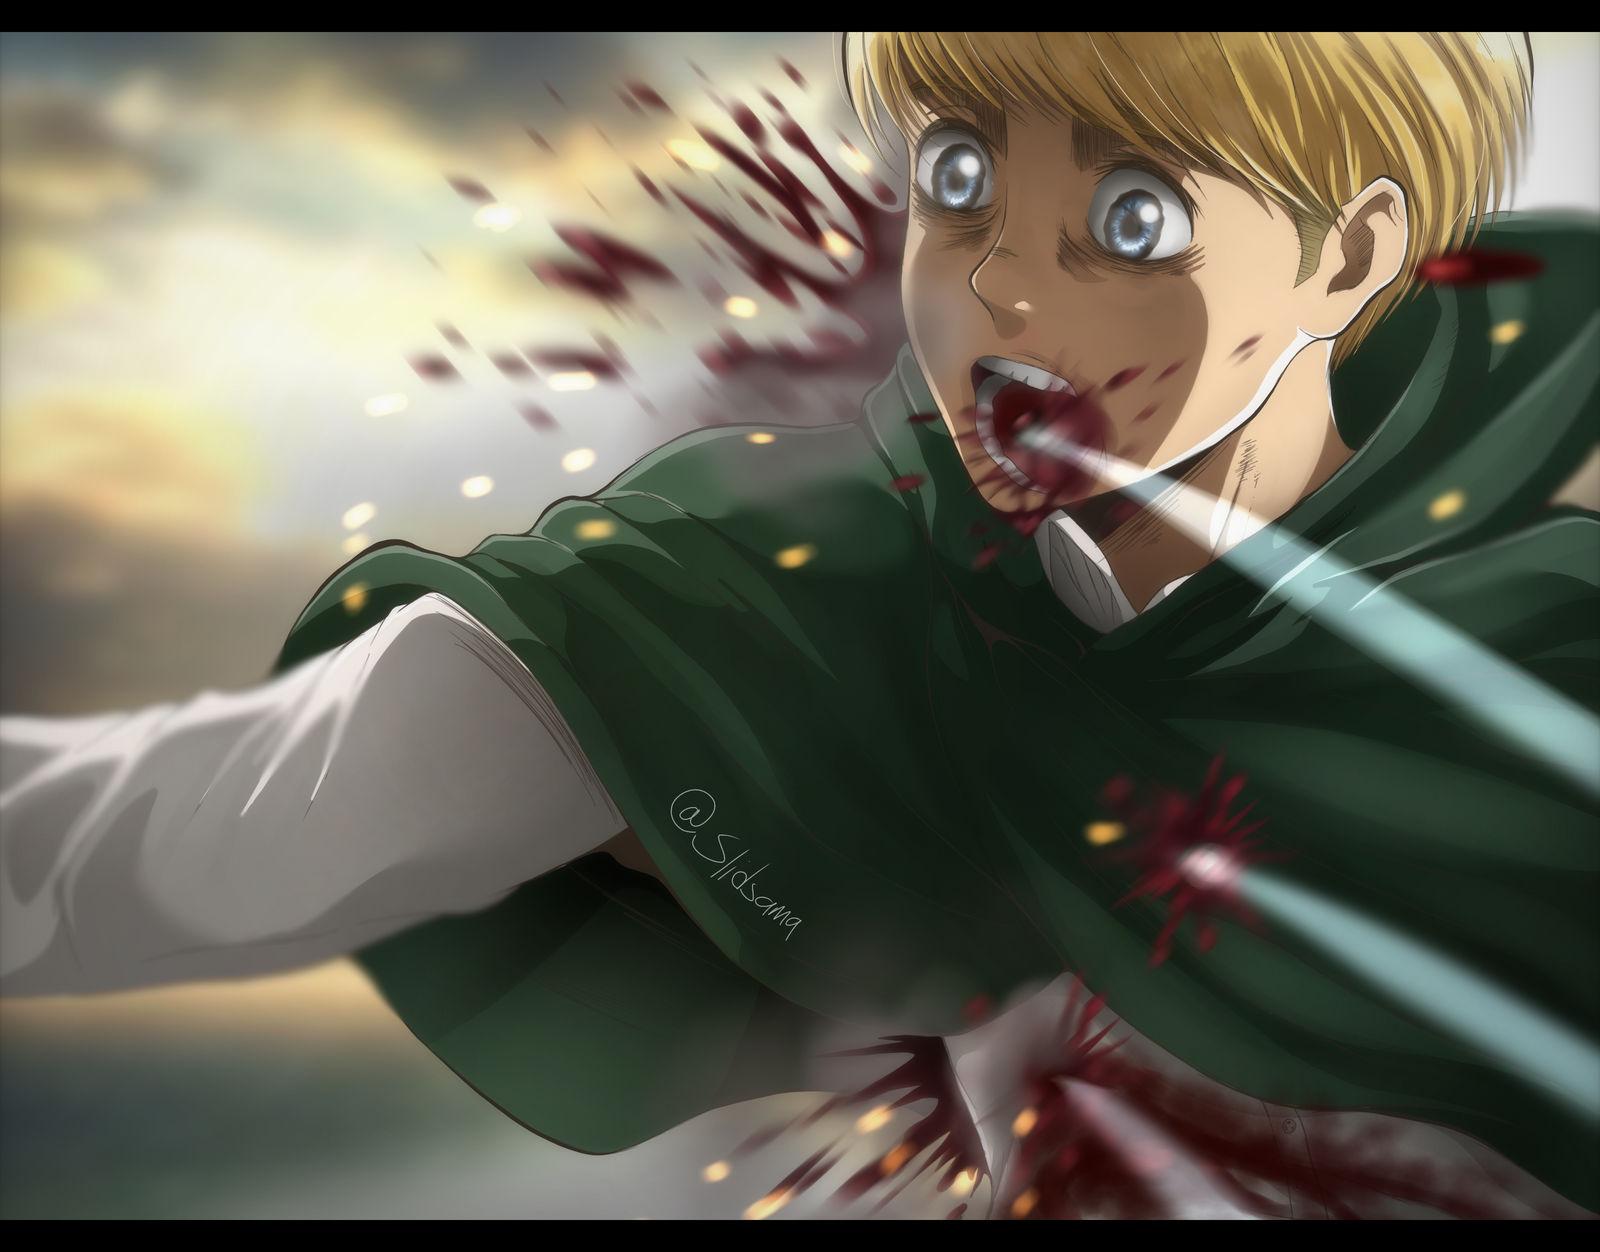 Attack on Titan Character: Armin Arlert